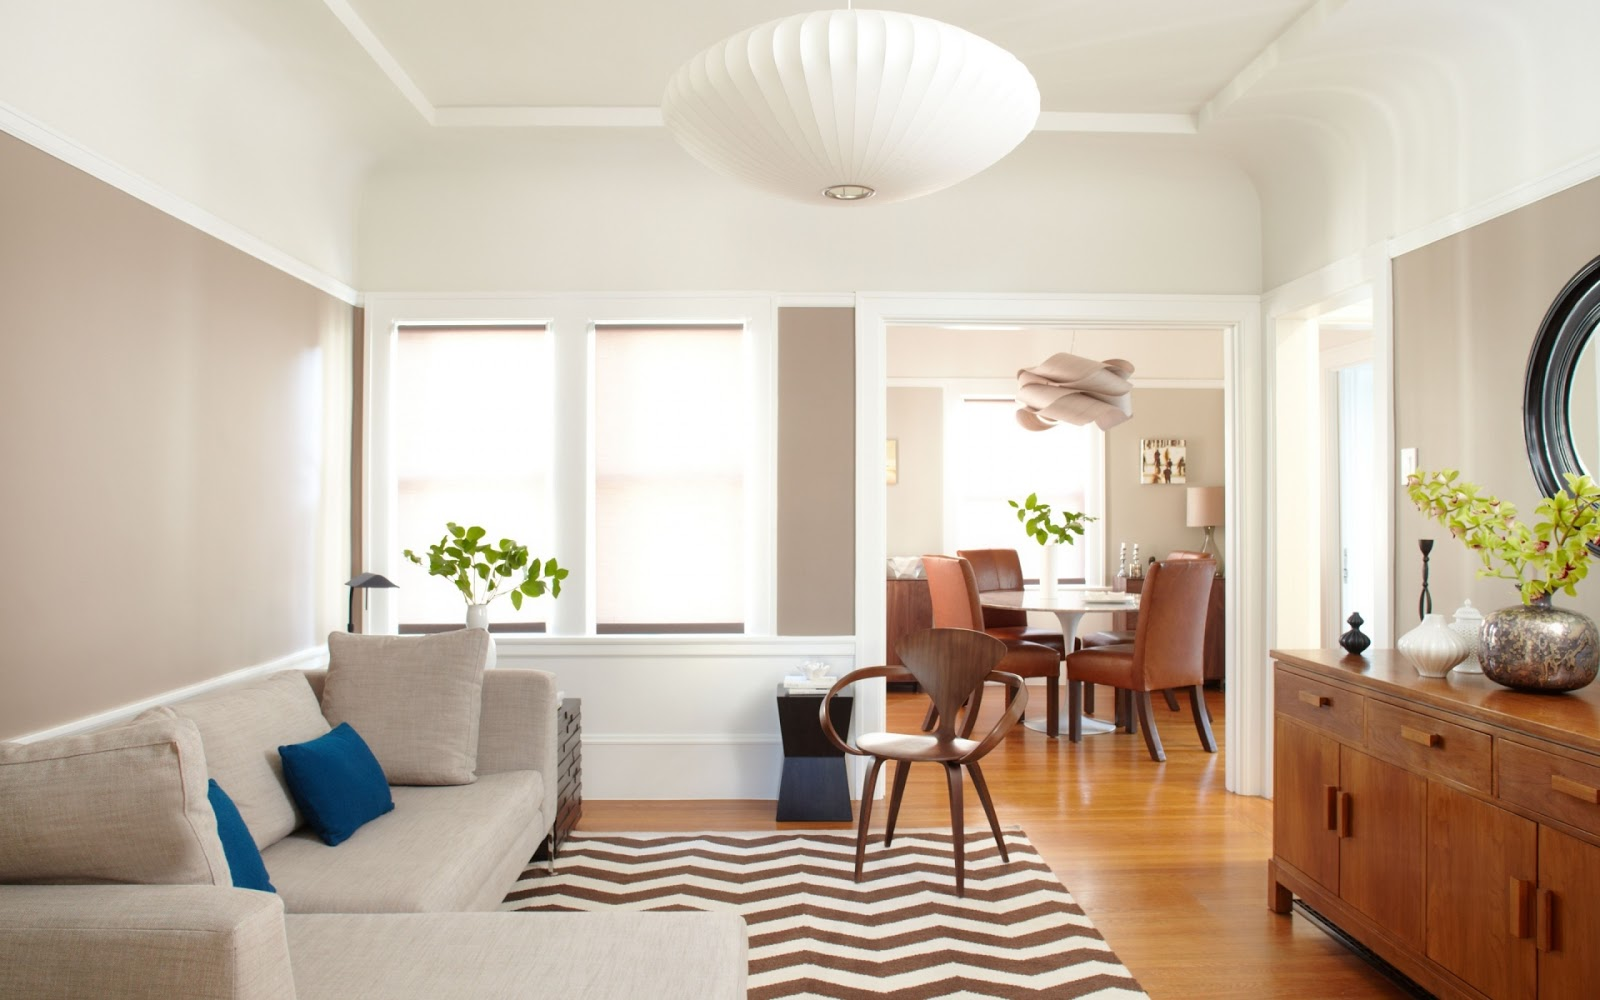 Desktop HD Wallpapers Bright Interior Design HD Wallpapers 1600x1000